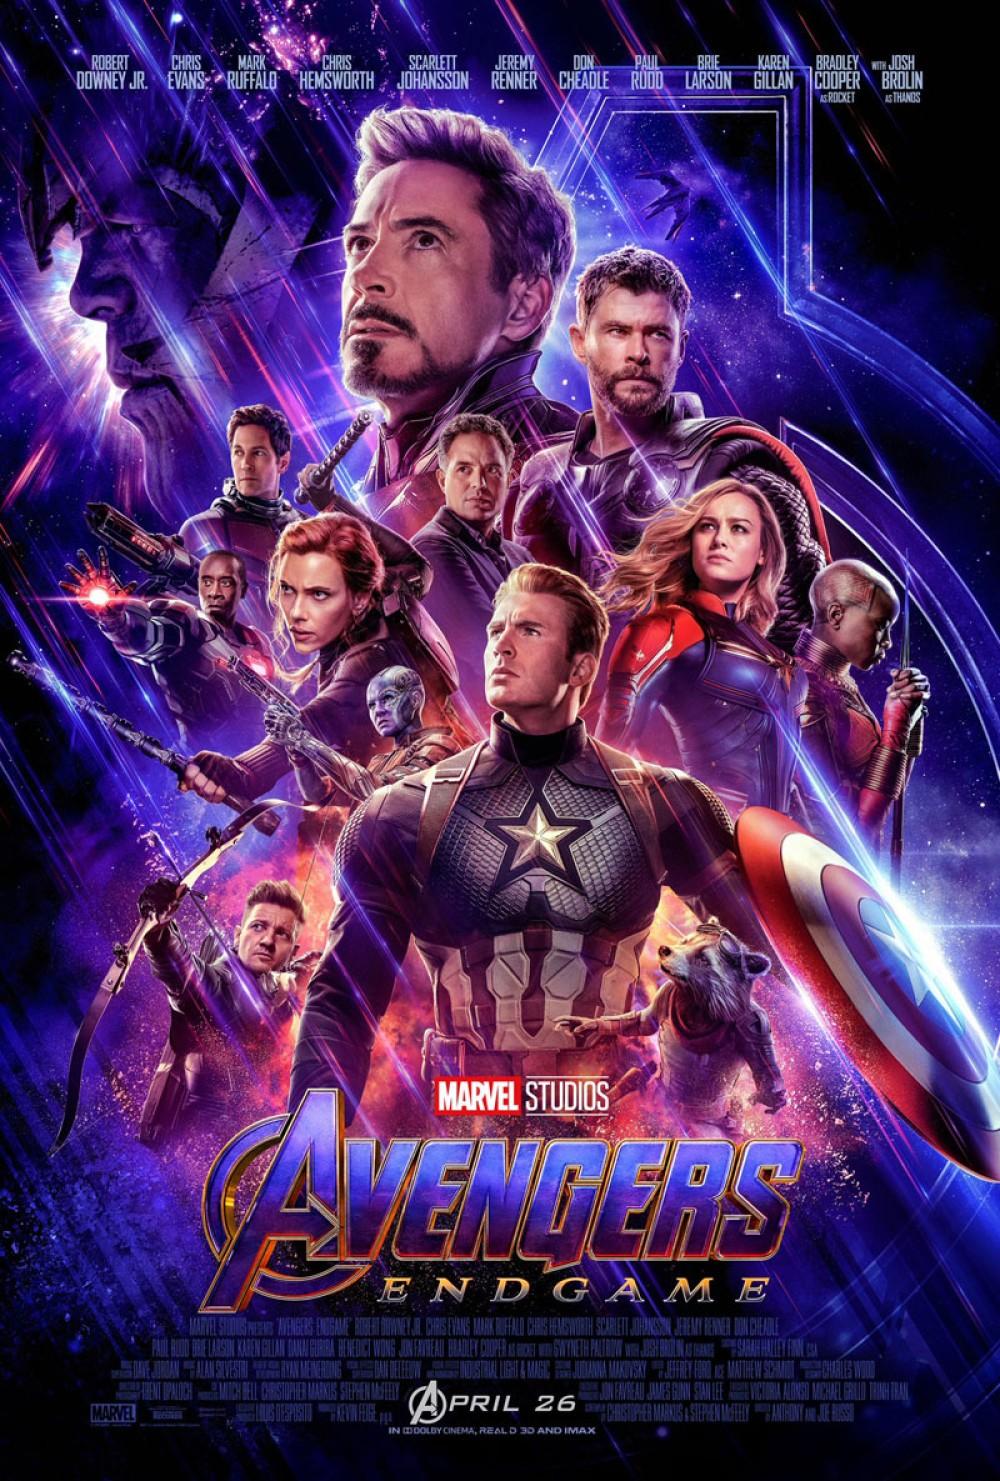 Avengers: Endgame, δείτε το νέο επικό trailer για την ταινία με φρέσκες πληροφορίες